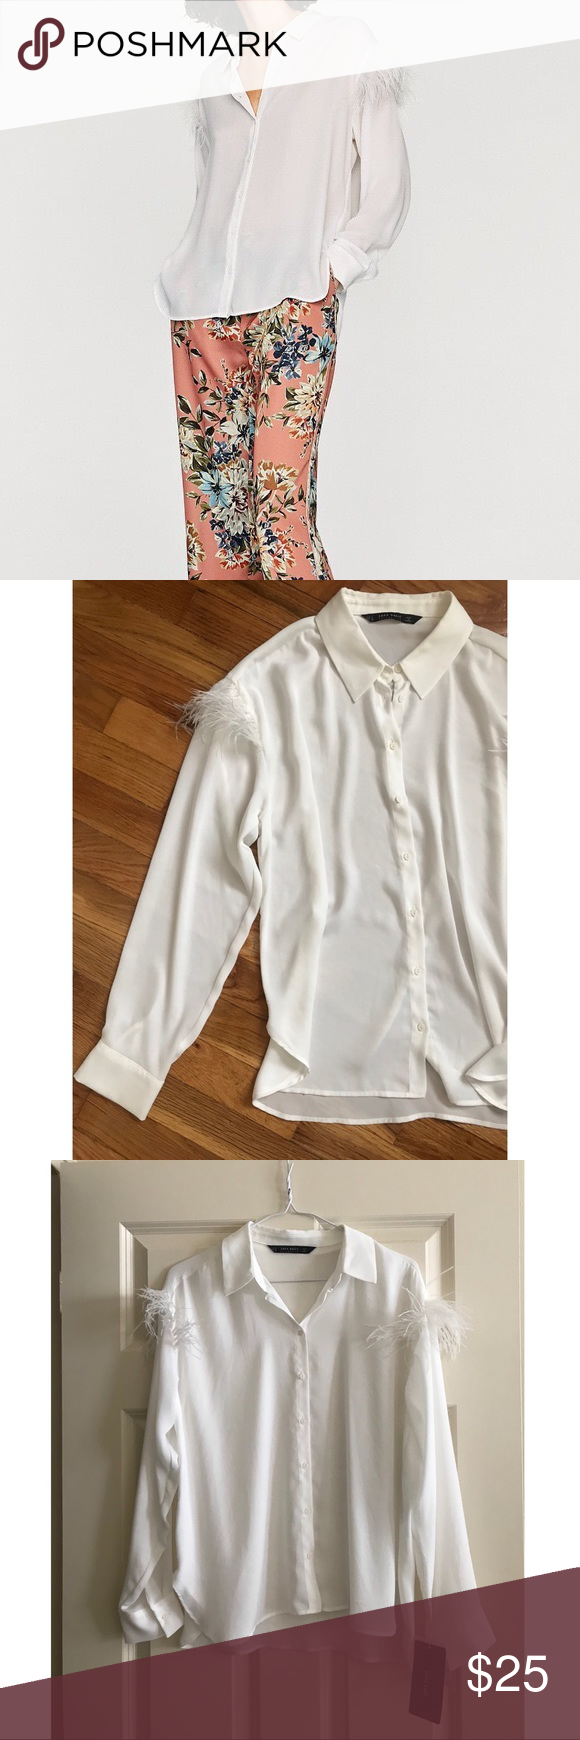 7edba30a341d0 ZARA FEATHER SHIRT New with tags white button down shirt Size  Medium Zara  Tops Blouses